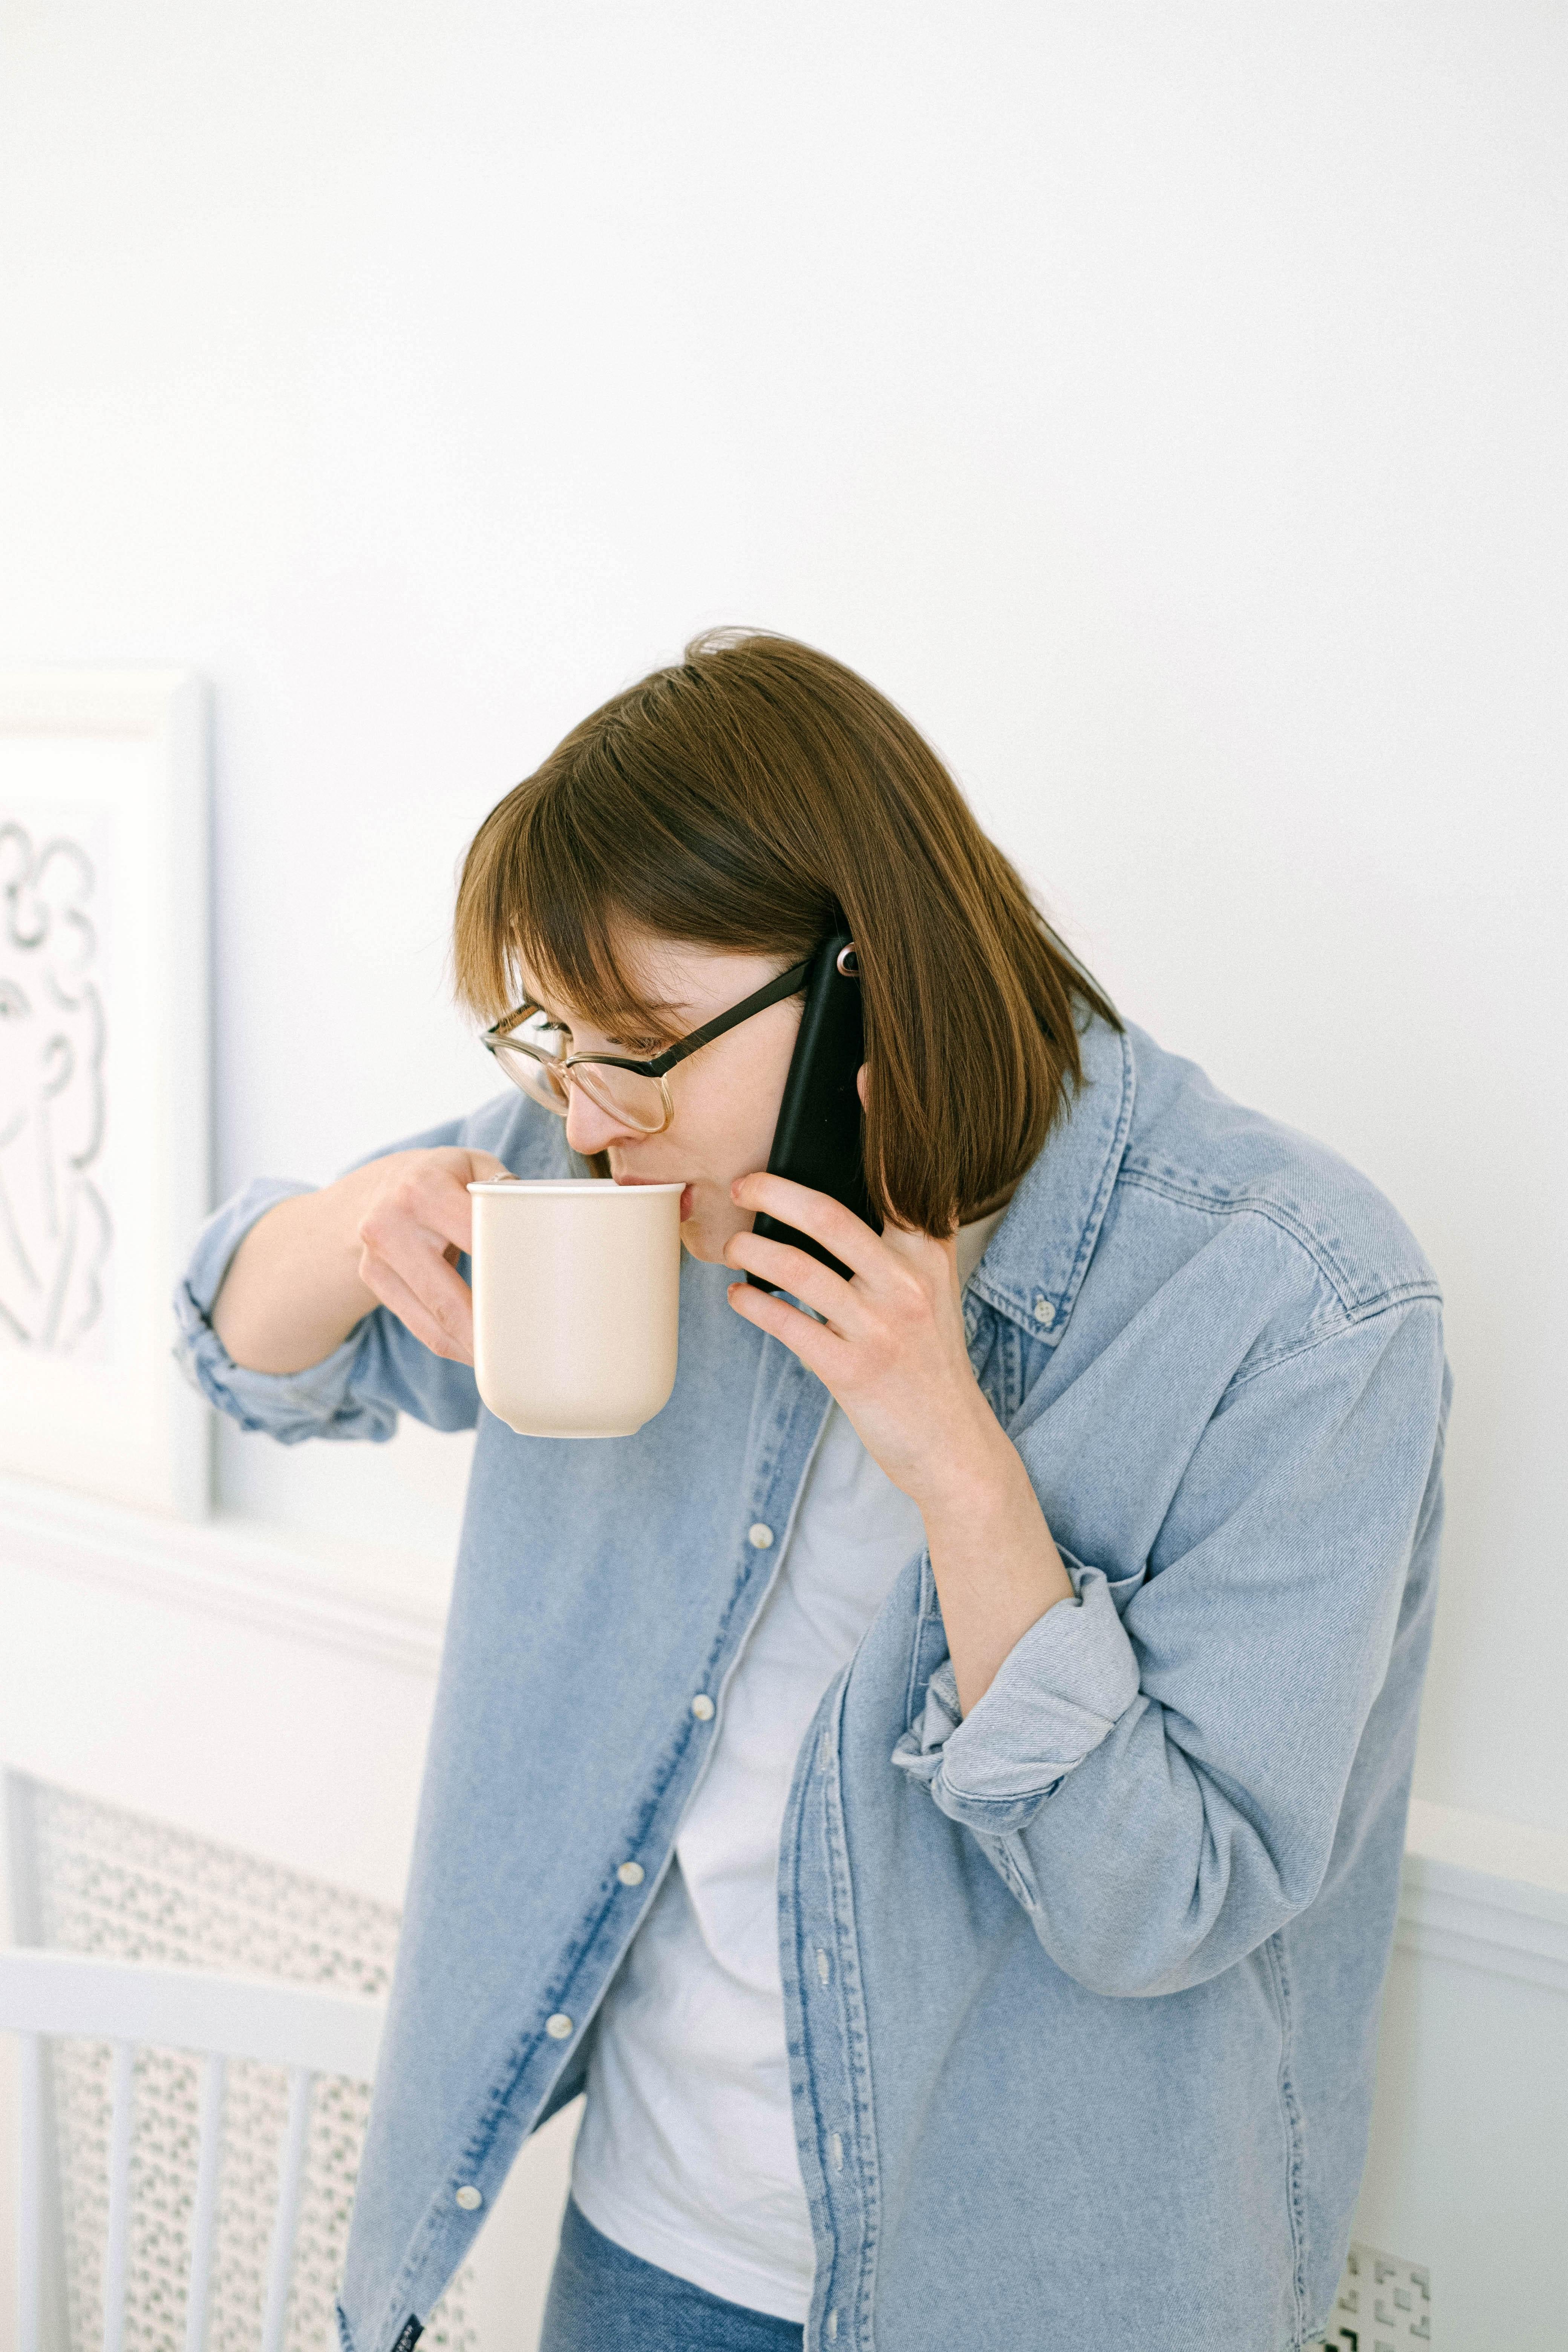 Woman Having a Phone Call · Free Stock Photo